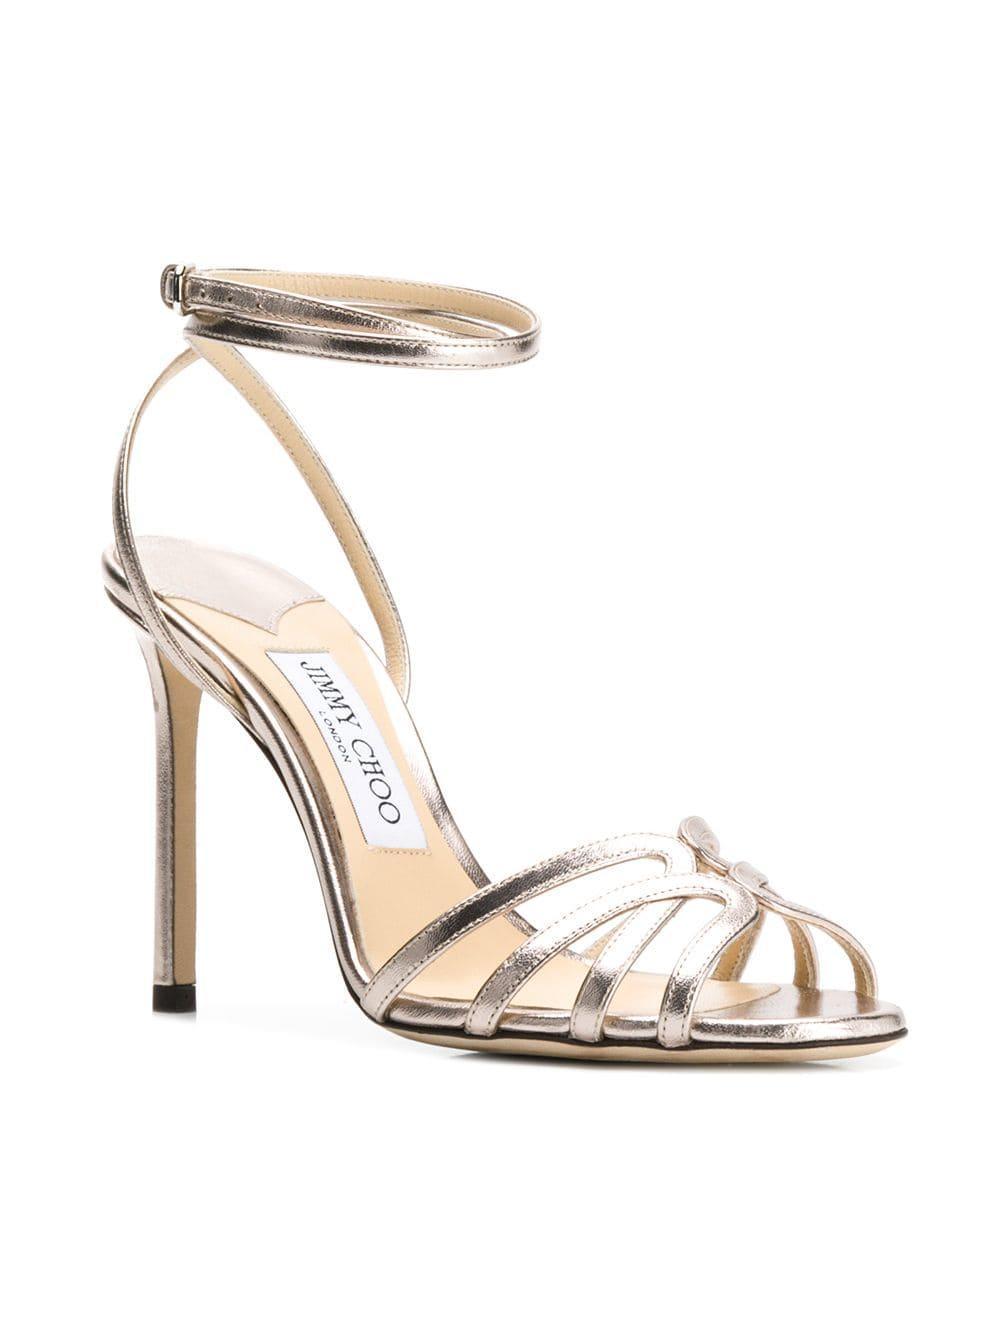 8b9e839969ac Lyst - Jimmy Choo Mimi 100 Leather Sandals in Metallic